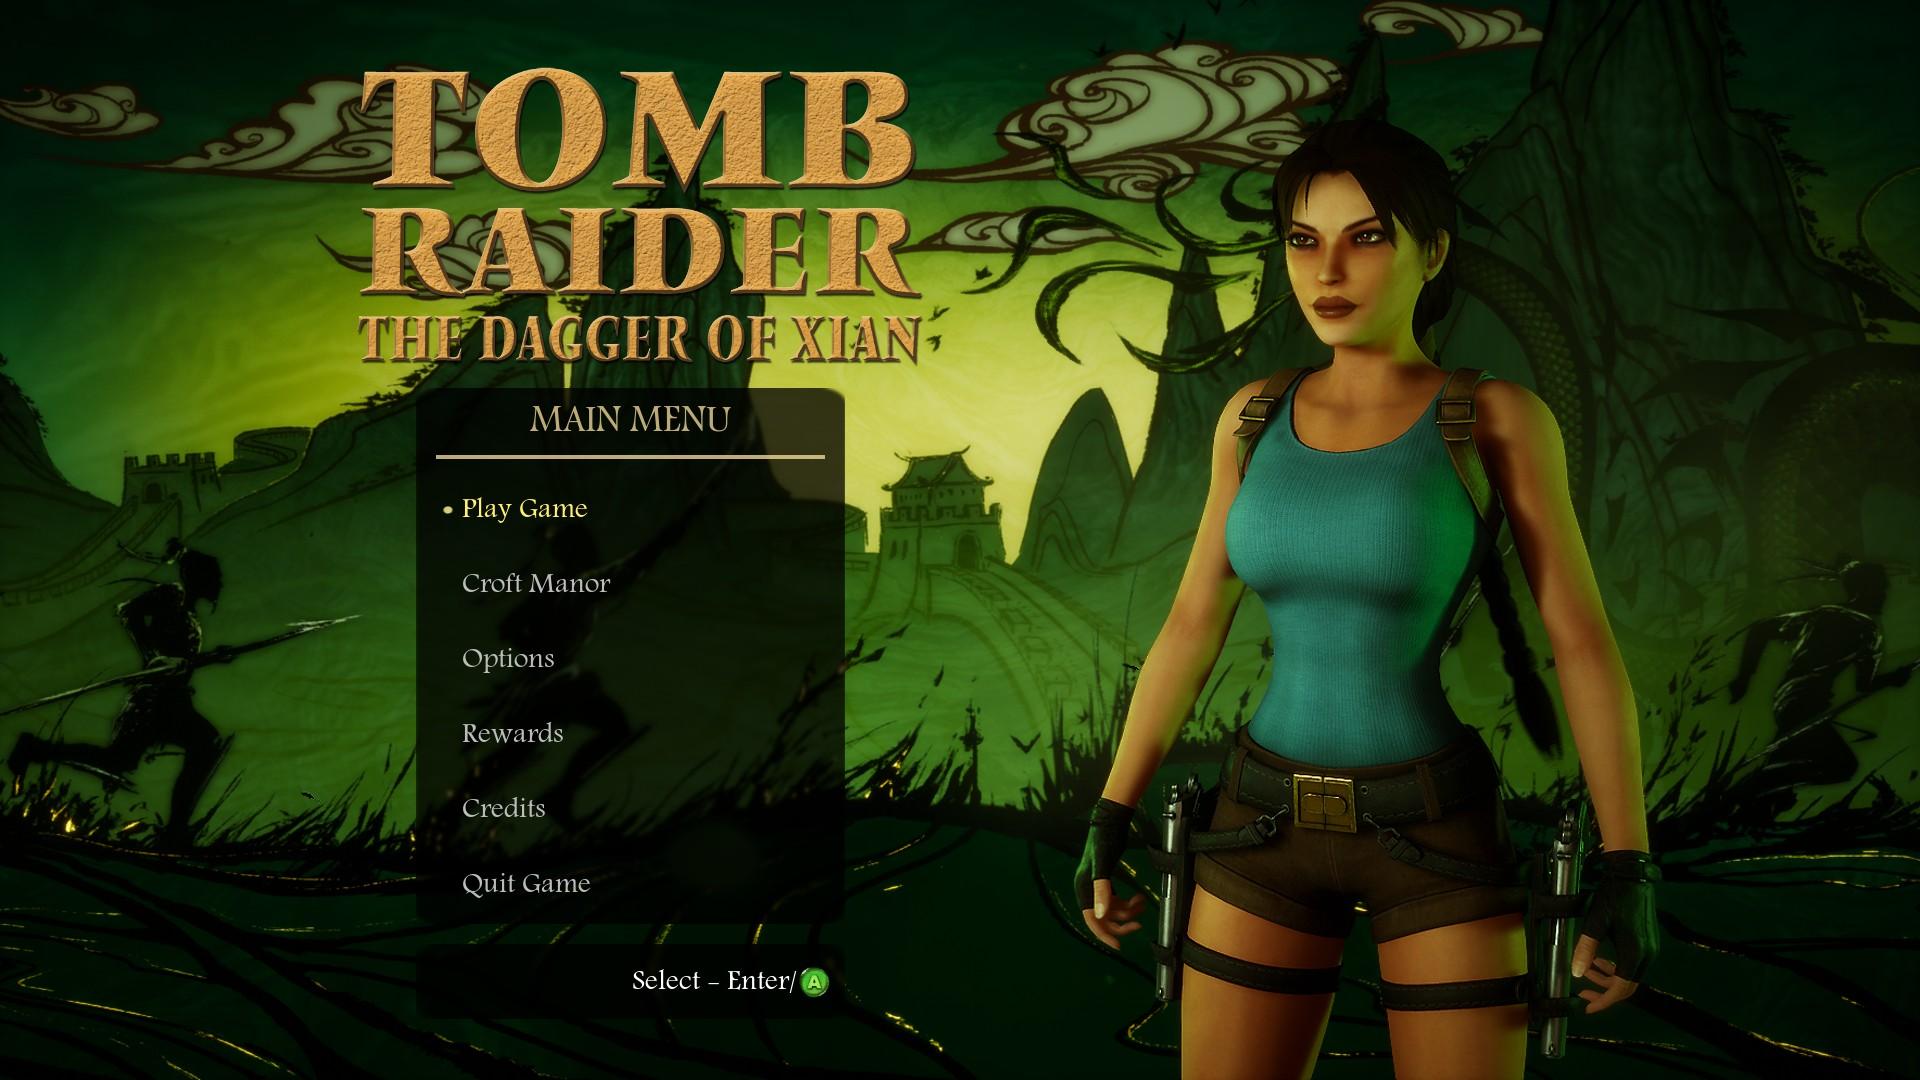 Tomb Raider 2 - Dagger of the Xian